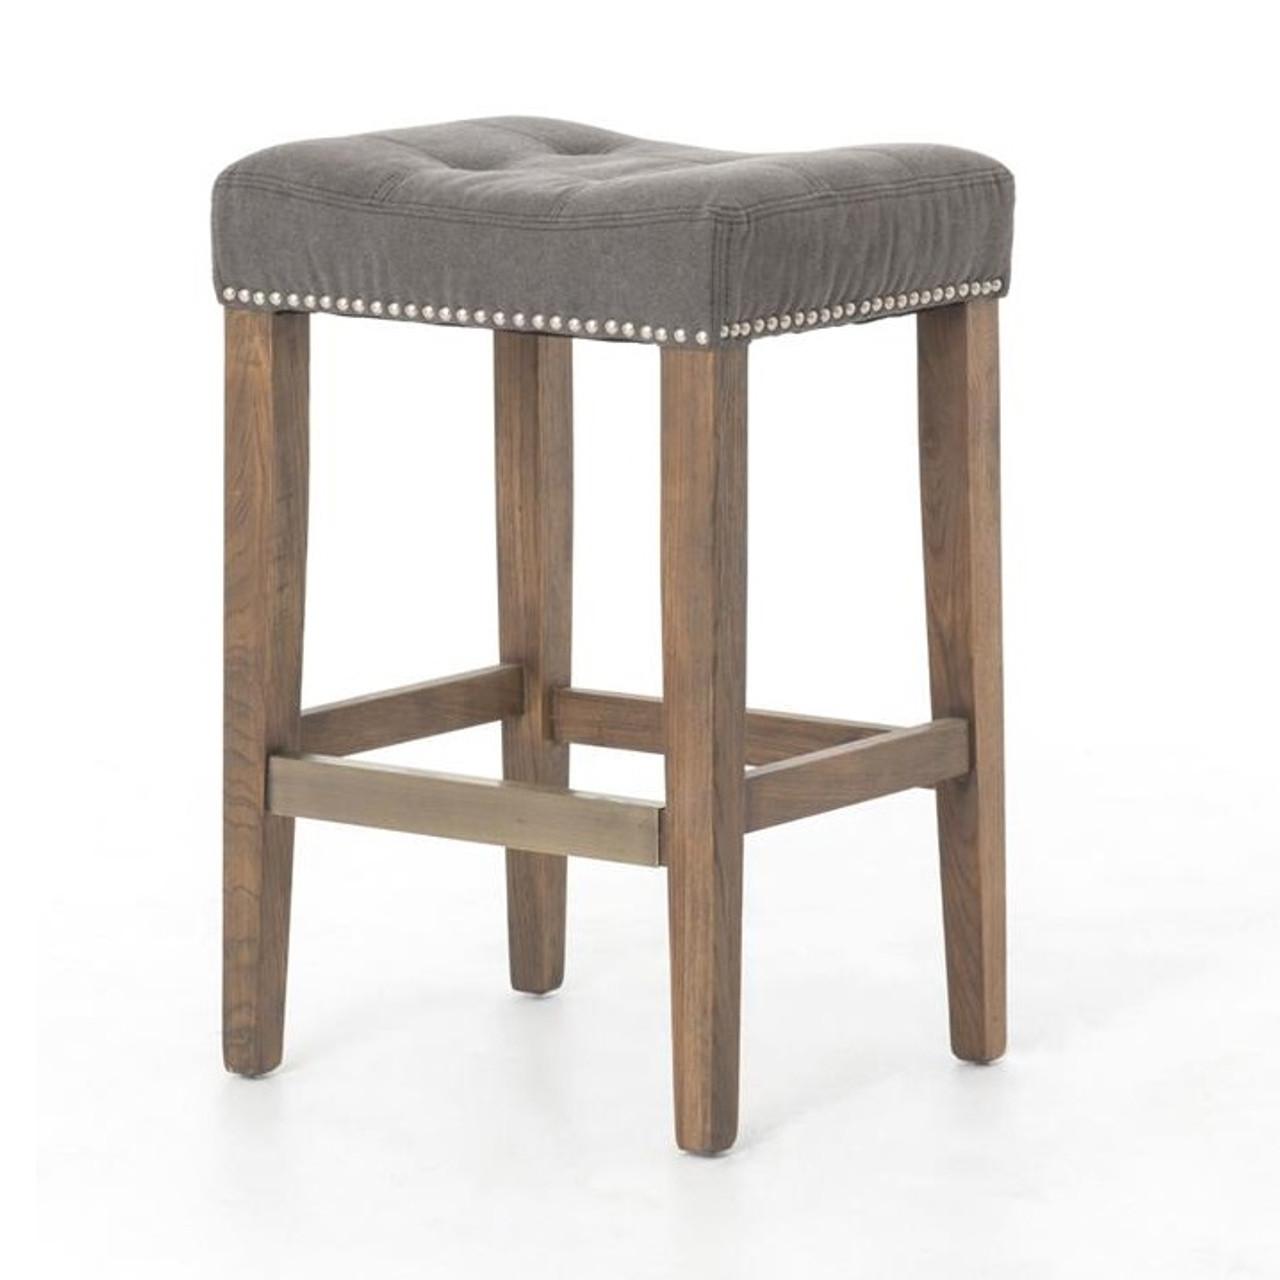 Sensational Ashford French Grey Tufted Nailhead Counter Stool Ibusinesslaw Wood Chair Design Ideas Ibusinesslaworg